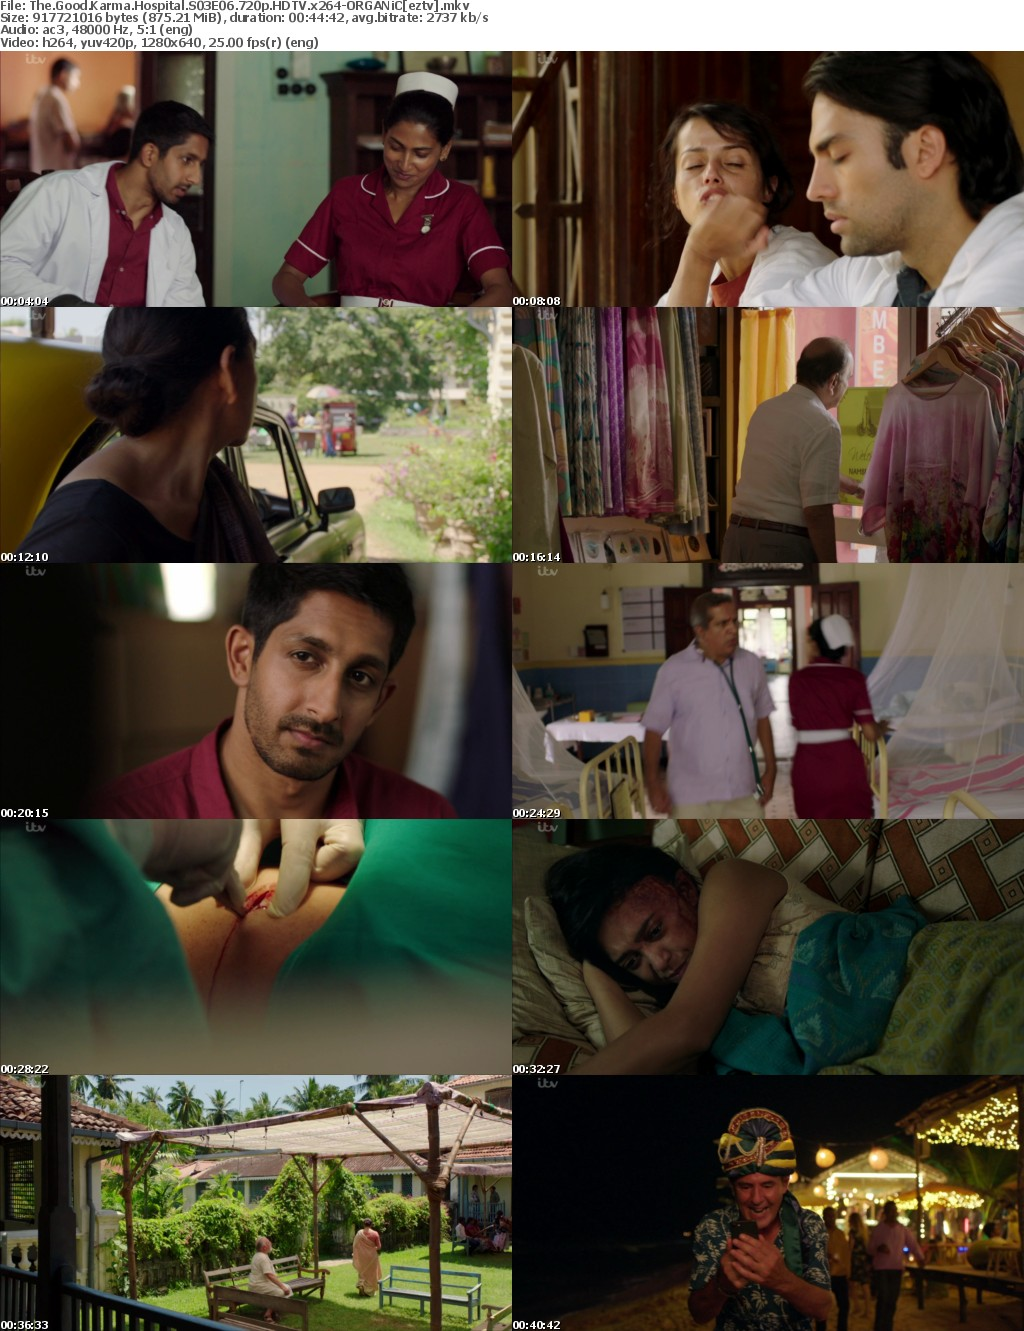 The Good Karma Hospital S03E06 720p HDTV x264-ORGANiC